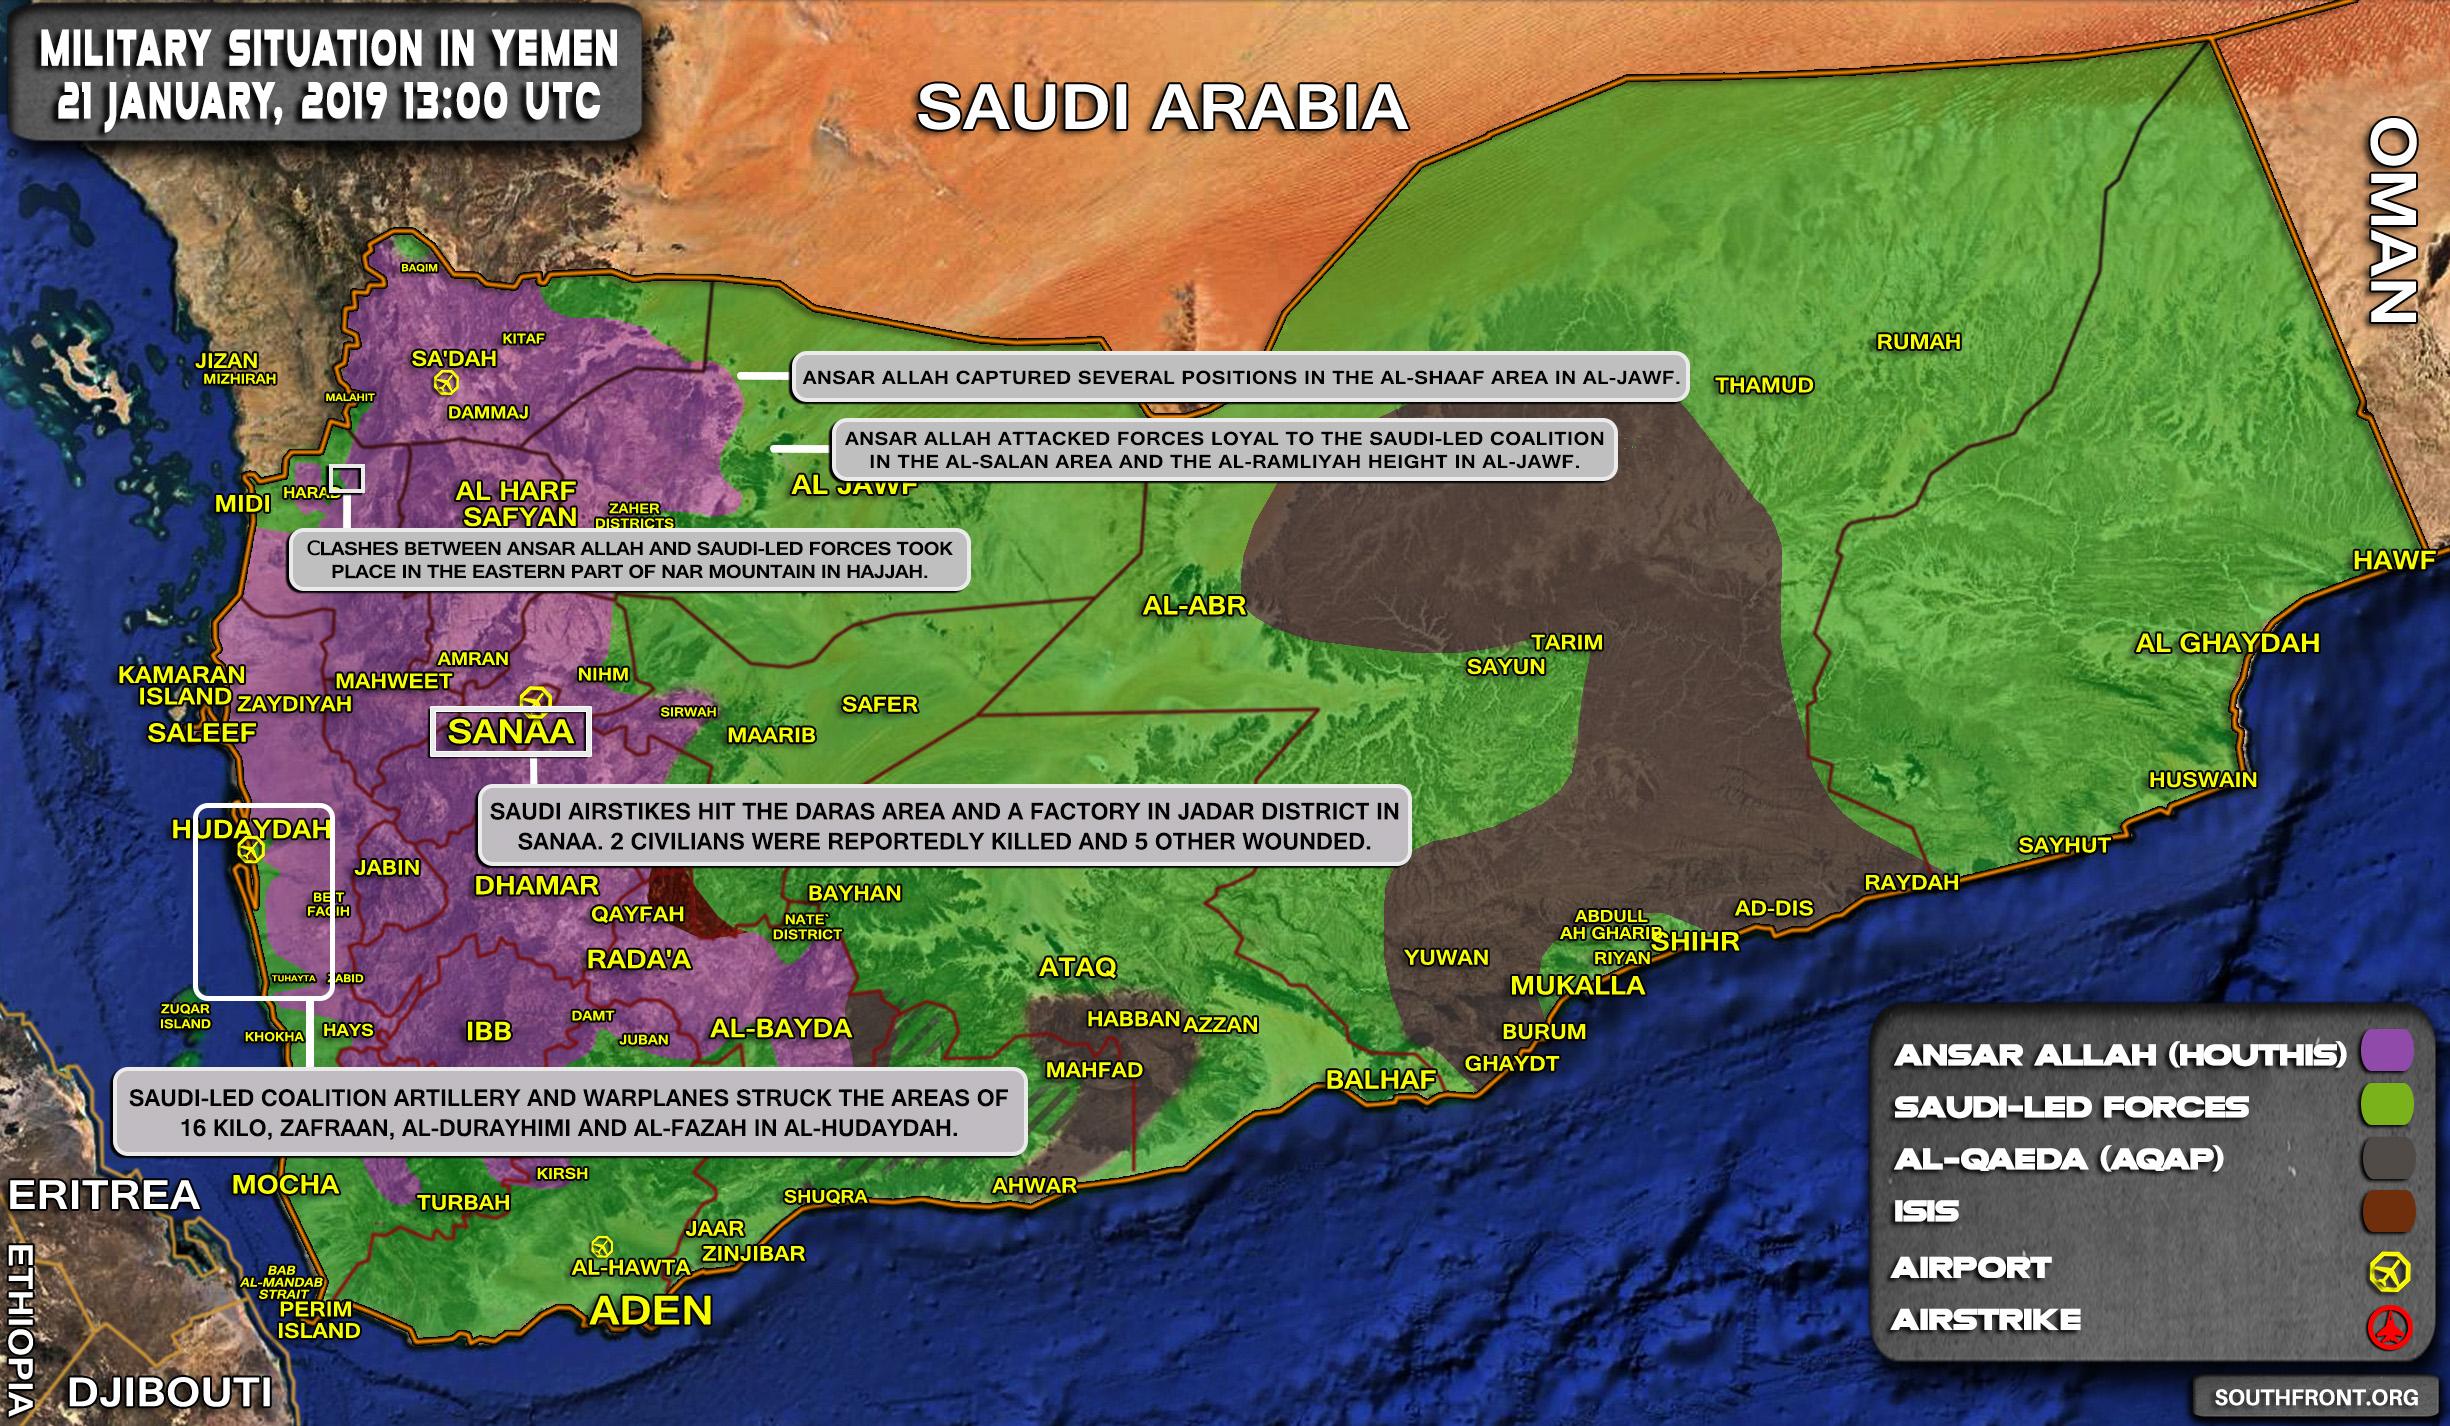 Military Situation In Yemen On January 21, 2019 (Map Update) on eritrea map, oman map, kenya map, zimbabwe map, burma map, malawi map, madagascar map, united arab emirates map, syria map, senegal map, asia map, egypt map, qatar map, algeria map, mali map, niger map, iraq map, israel map, middle east map, burundi map, north africa map, namibia map, somalia map, nepal map, sudan map, mozambique map, hungary map, persian gulf map, liberia map, angola map, morocco map, cameroon map, rwanda map, libya map, tunisia map, saudi arabia map,